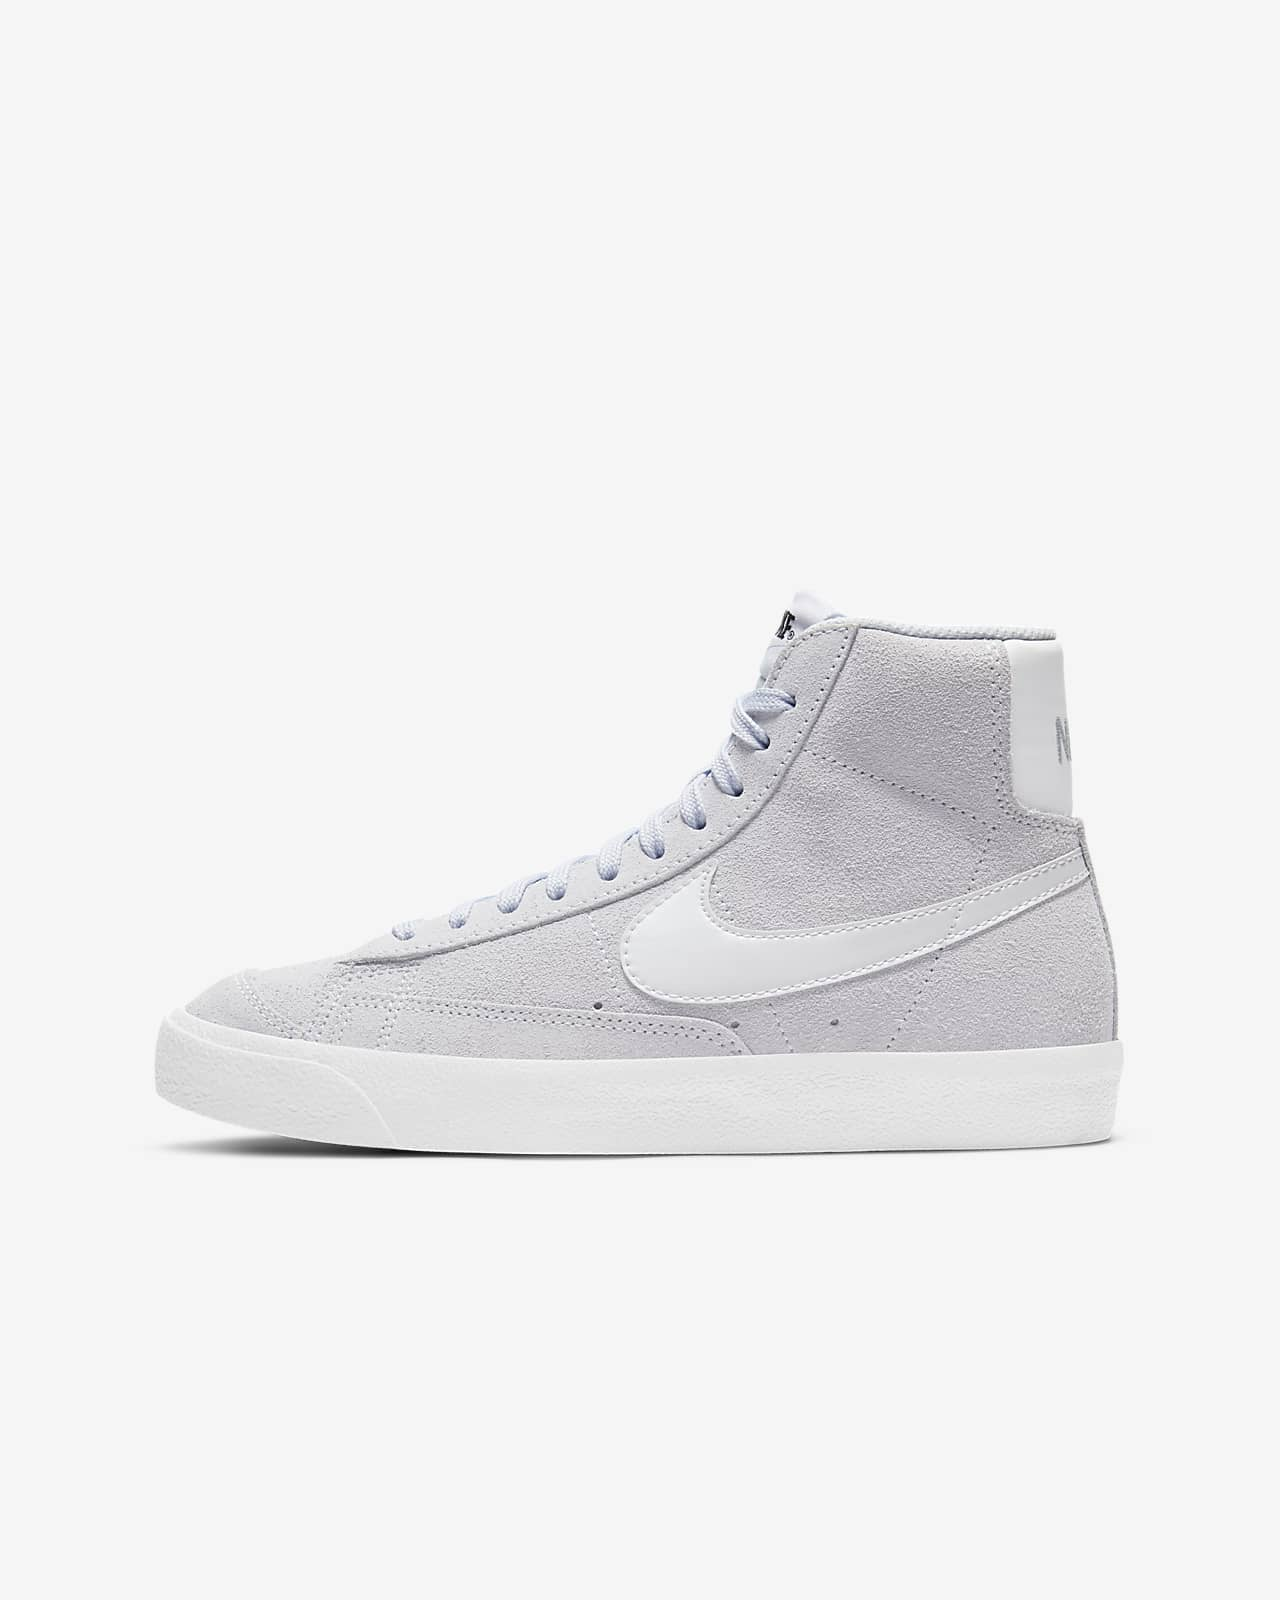 Nike Blazer Mid '77 Suede Big Kids' Shoe